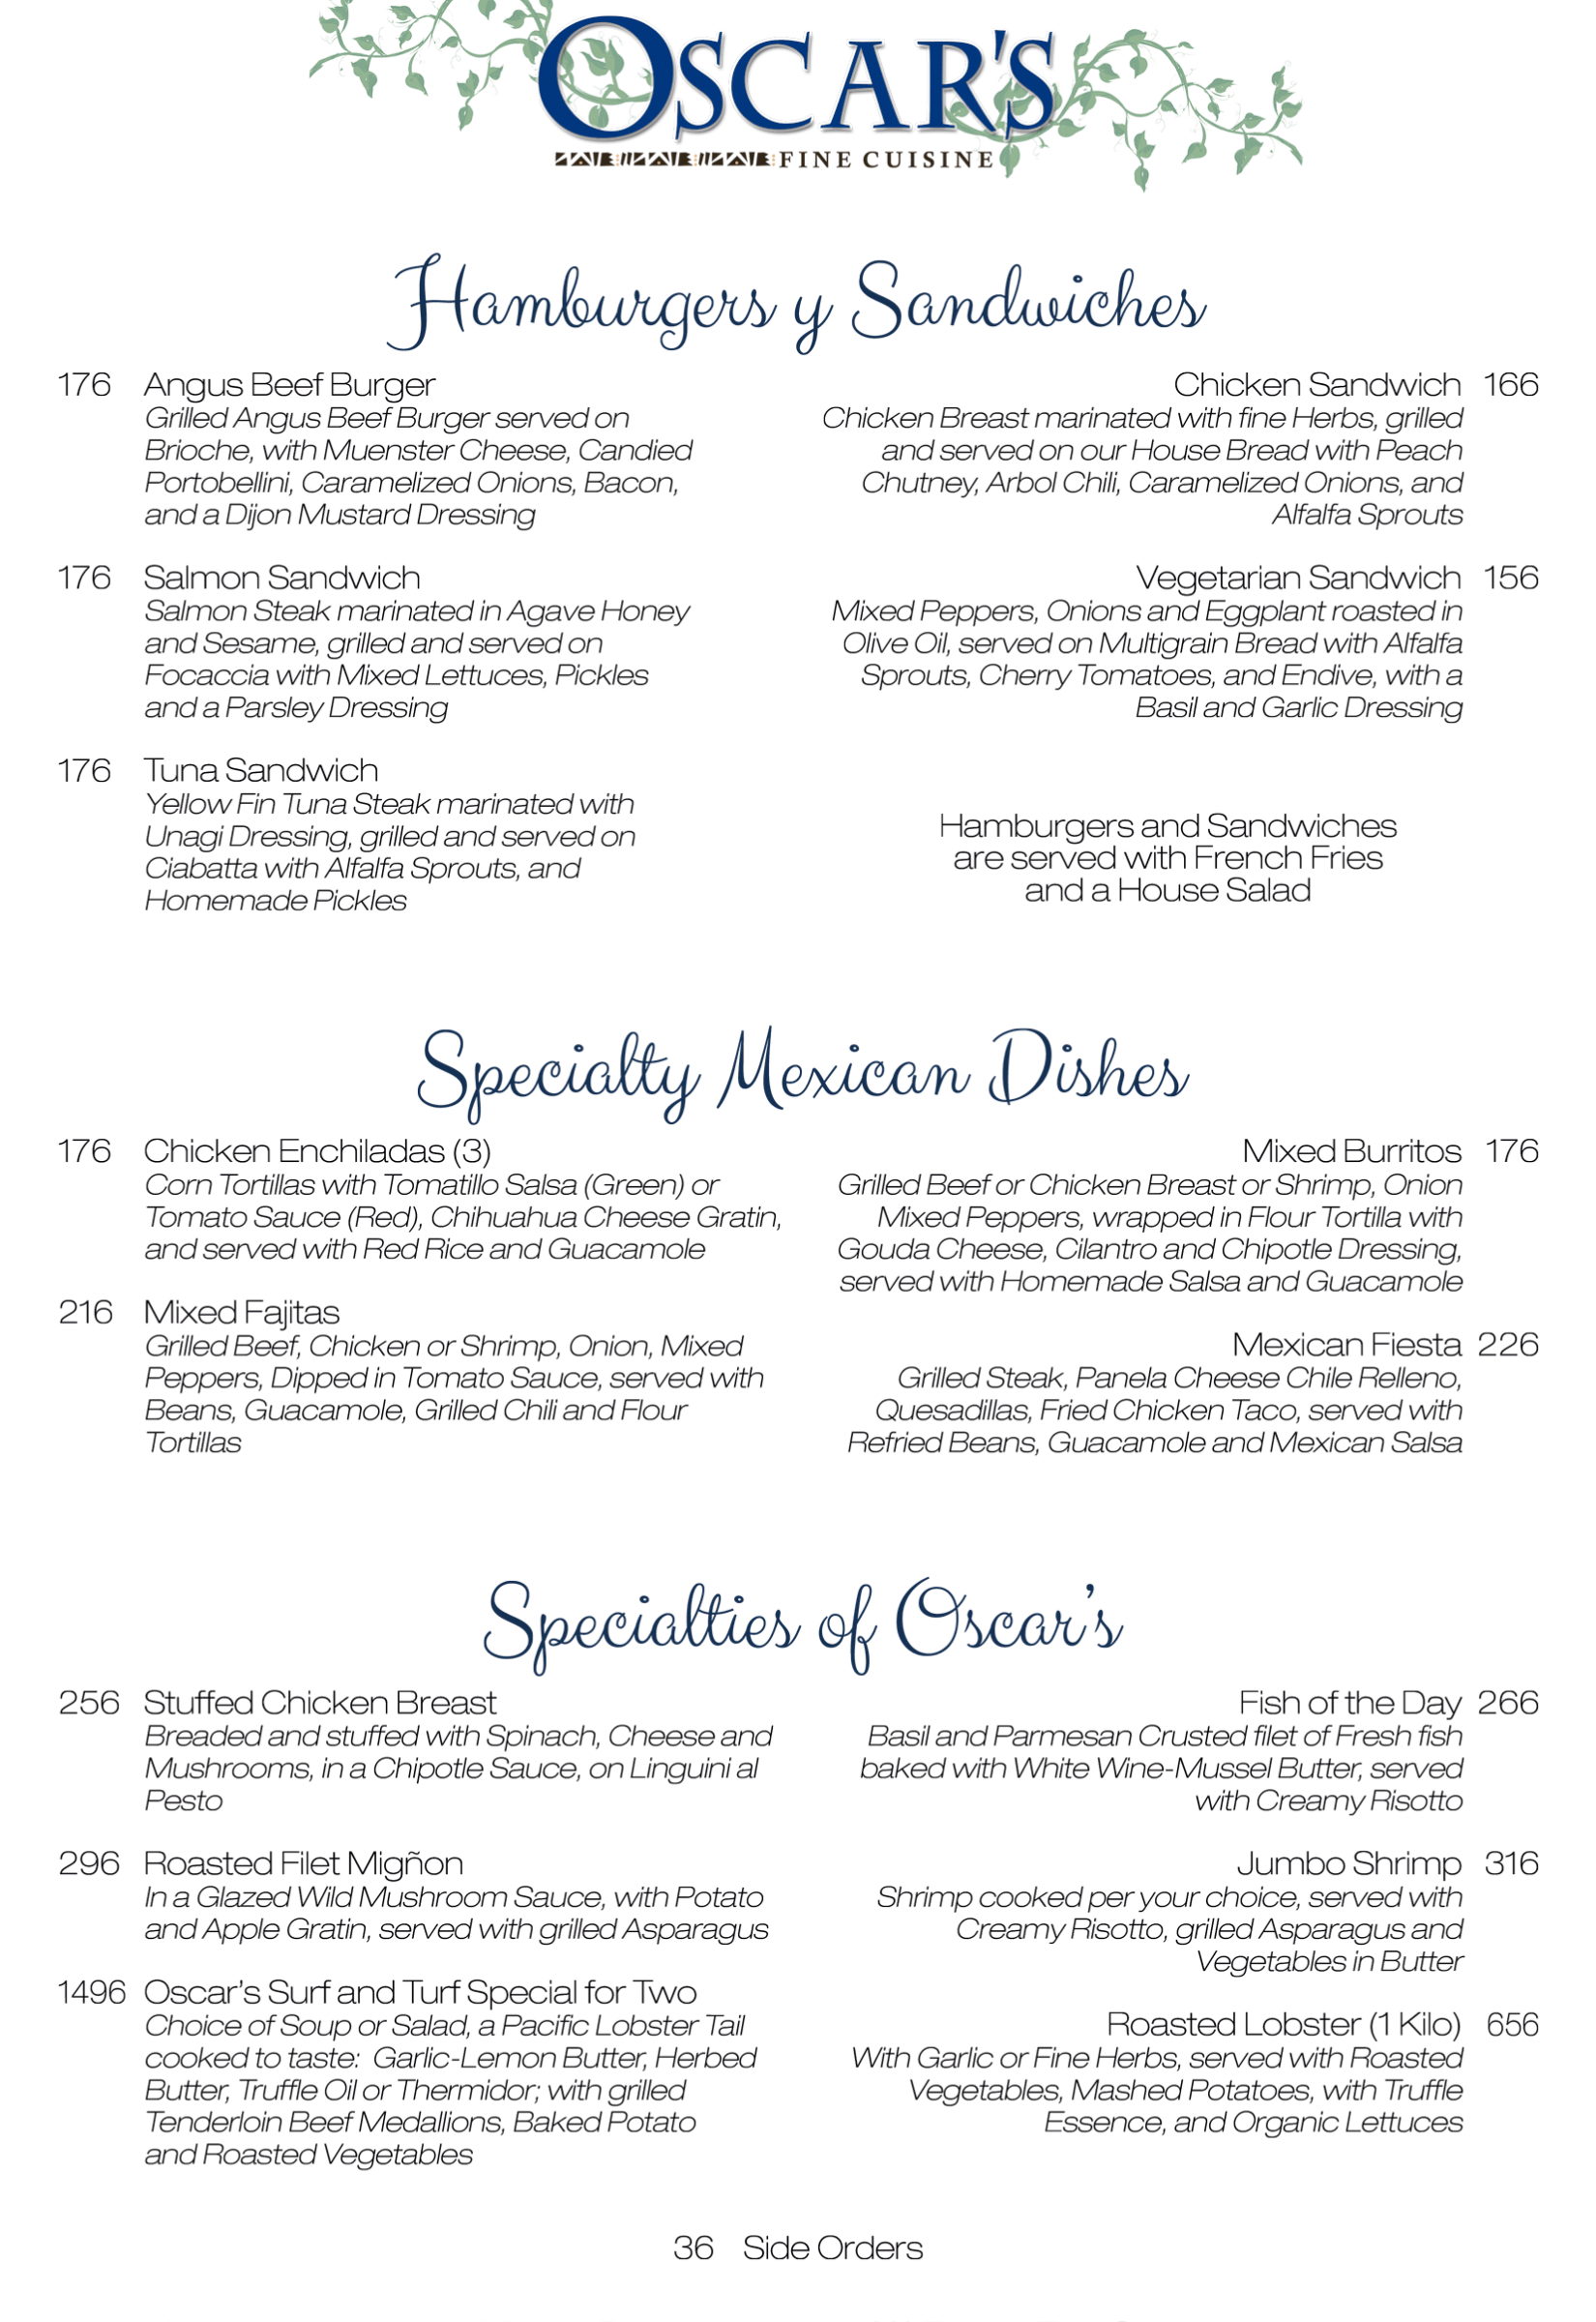 oscars-comida-ver2017-inglesl-back